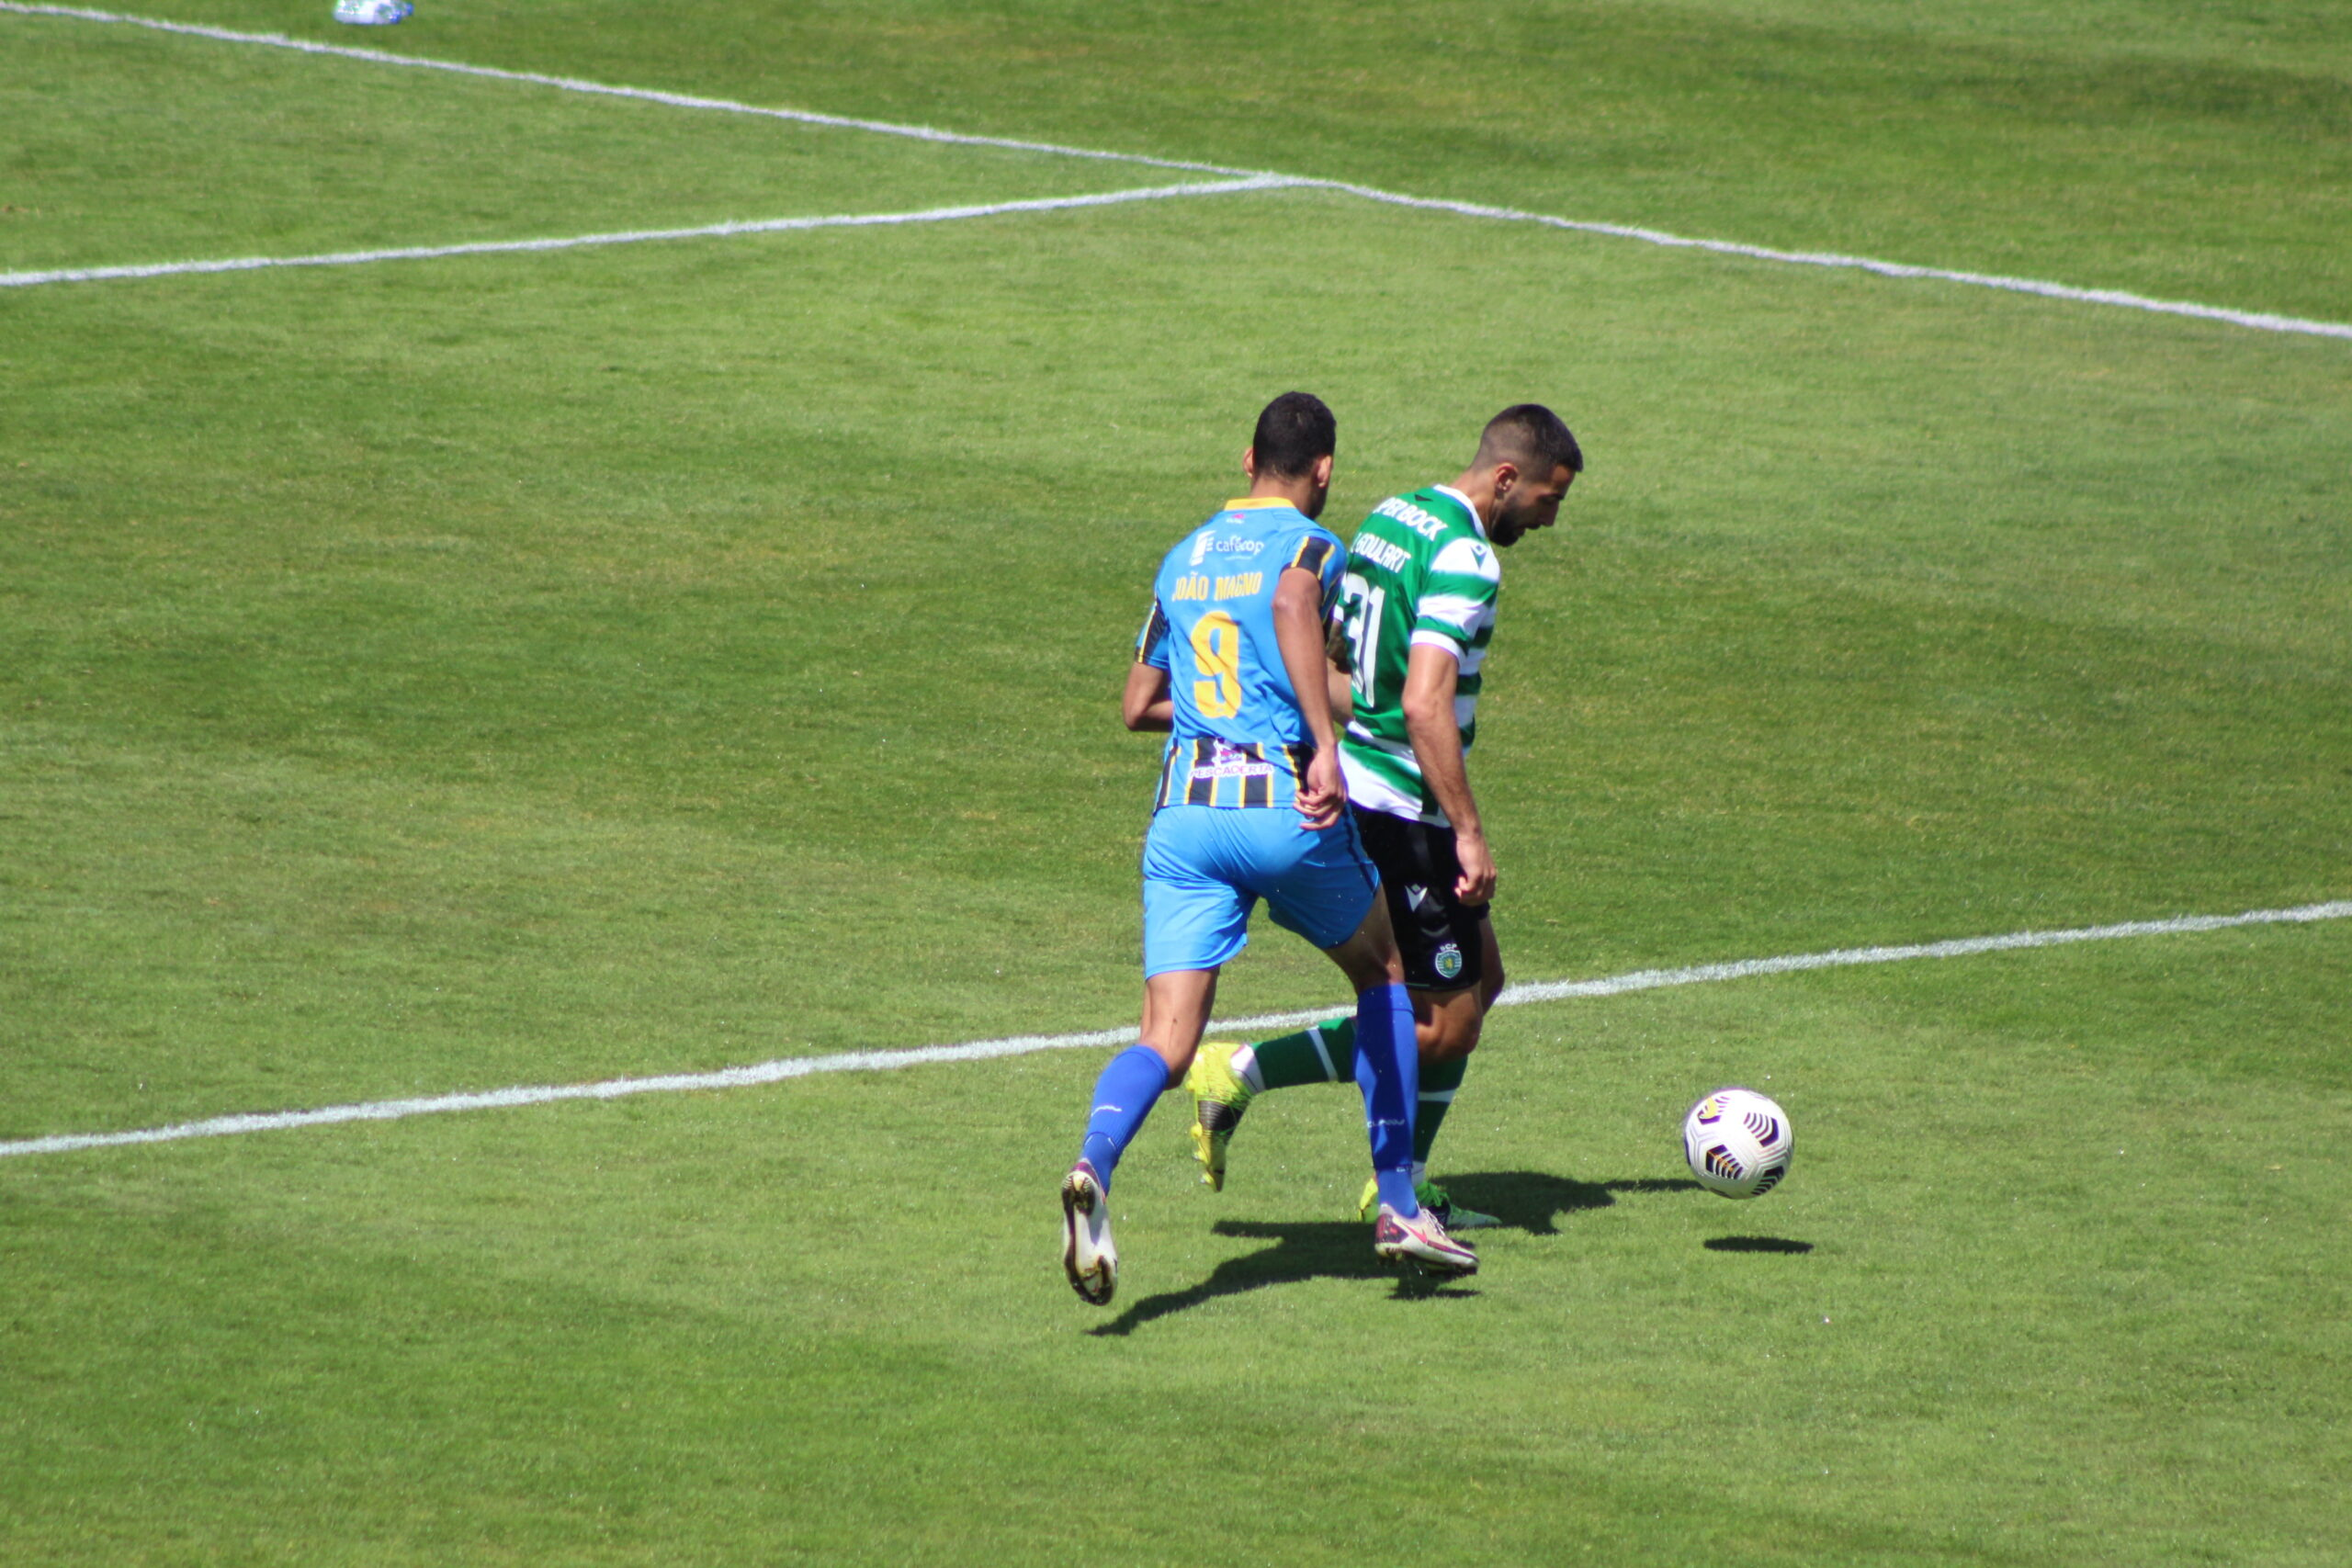 Real SC 0-0 Sporting Sad B